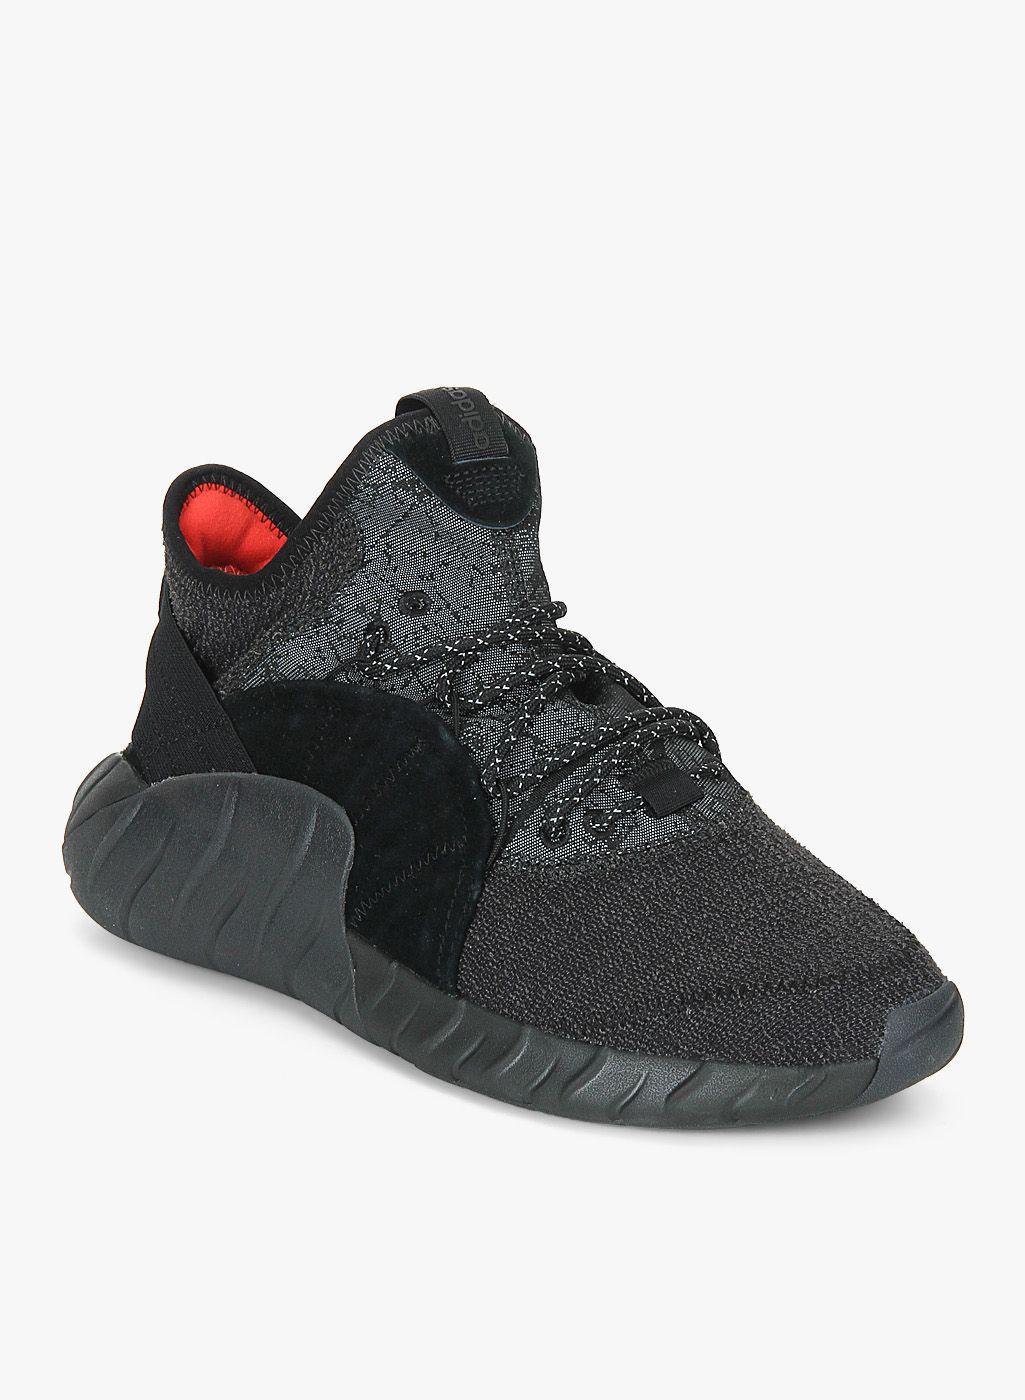 b124a876e13 Buy Adidas Originals Tubular Rise Black Sneakers Online - 4778945 - Jabong